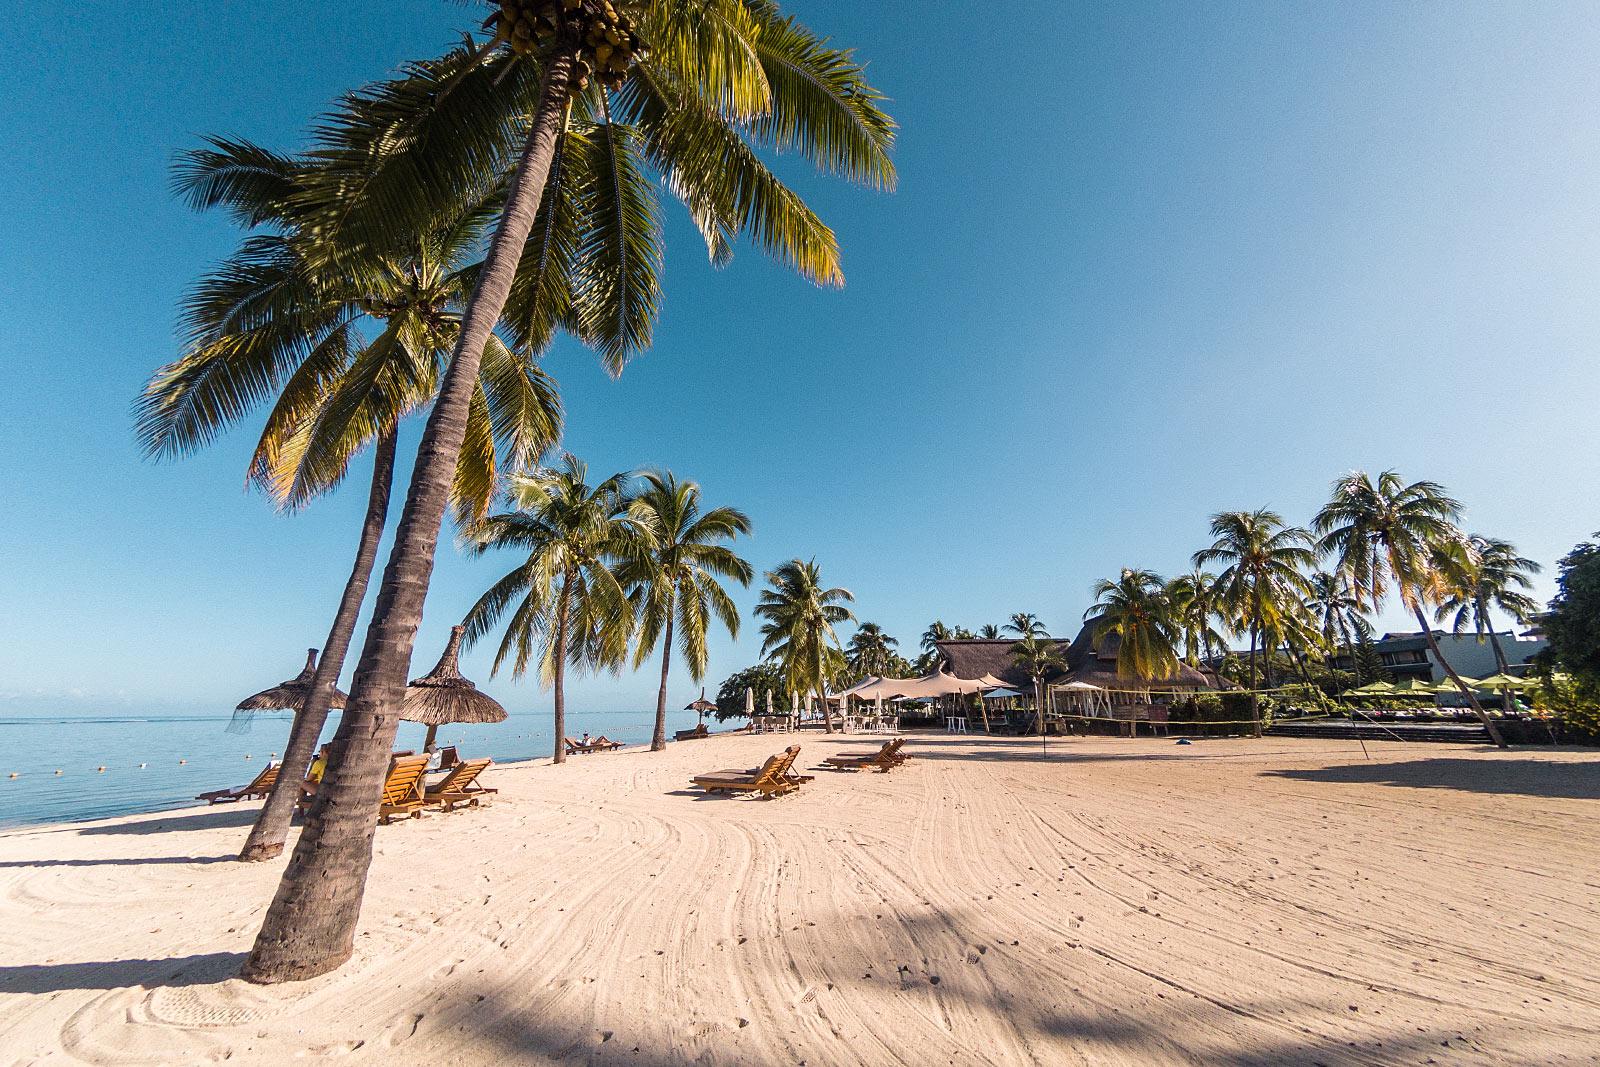 sofitel mauriitus sandstrand palmen strand travel blogger sunnyinga